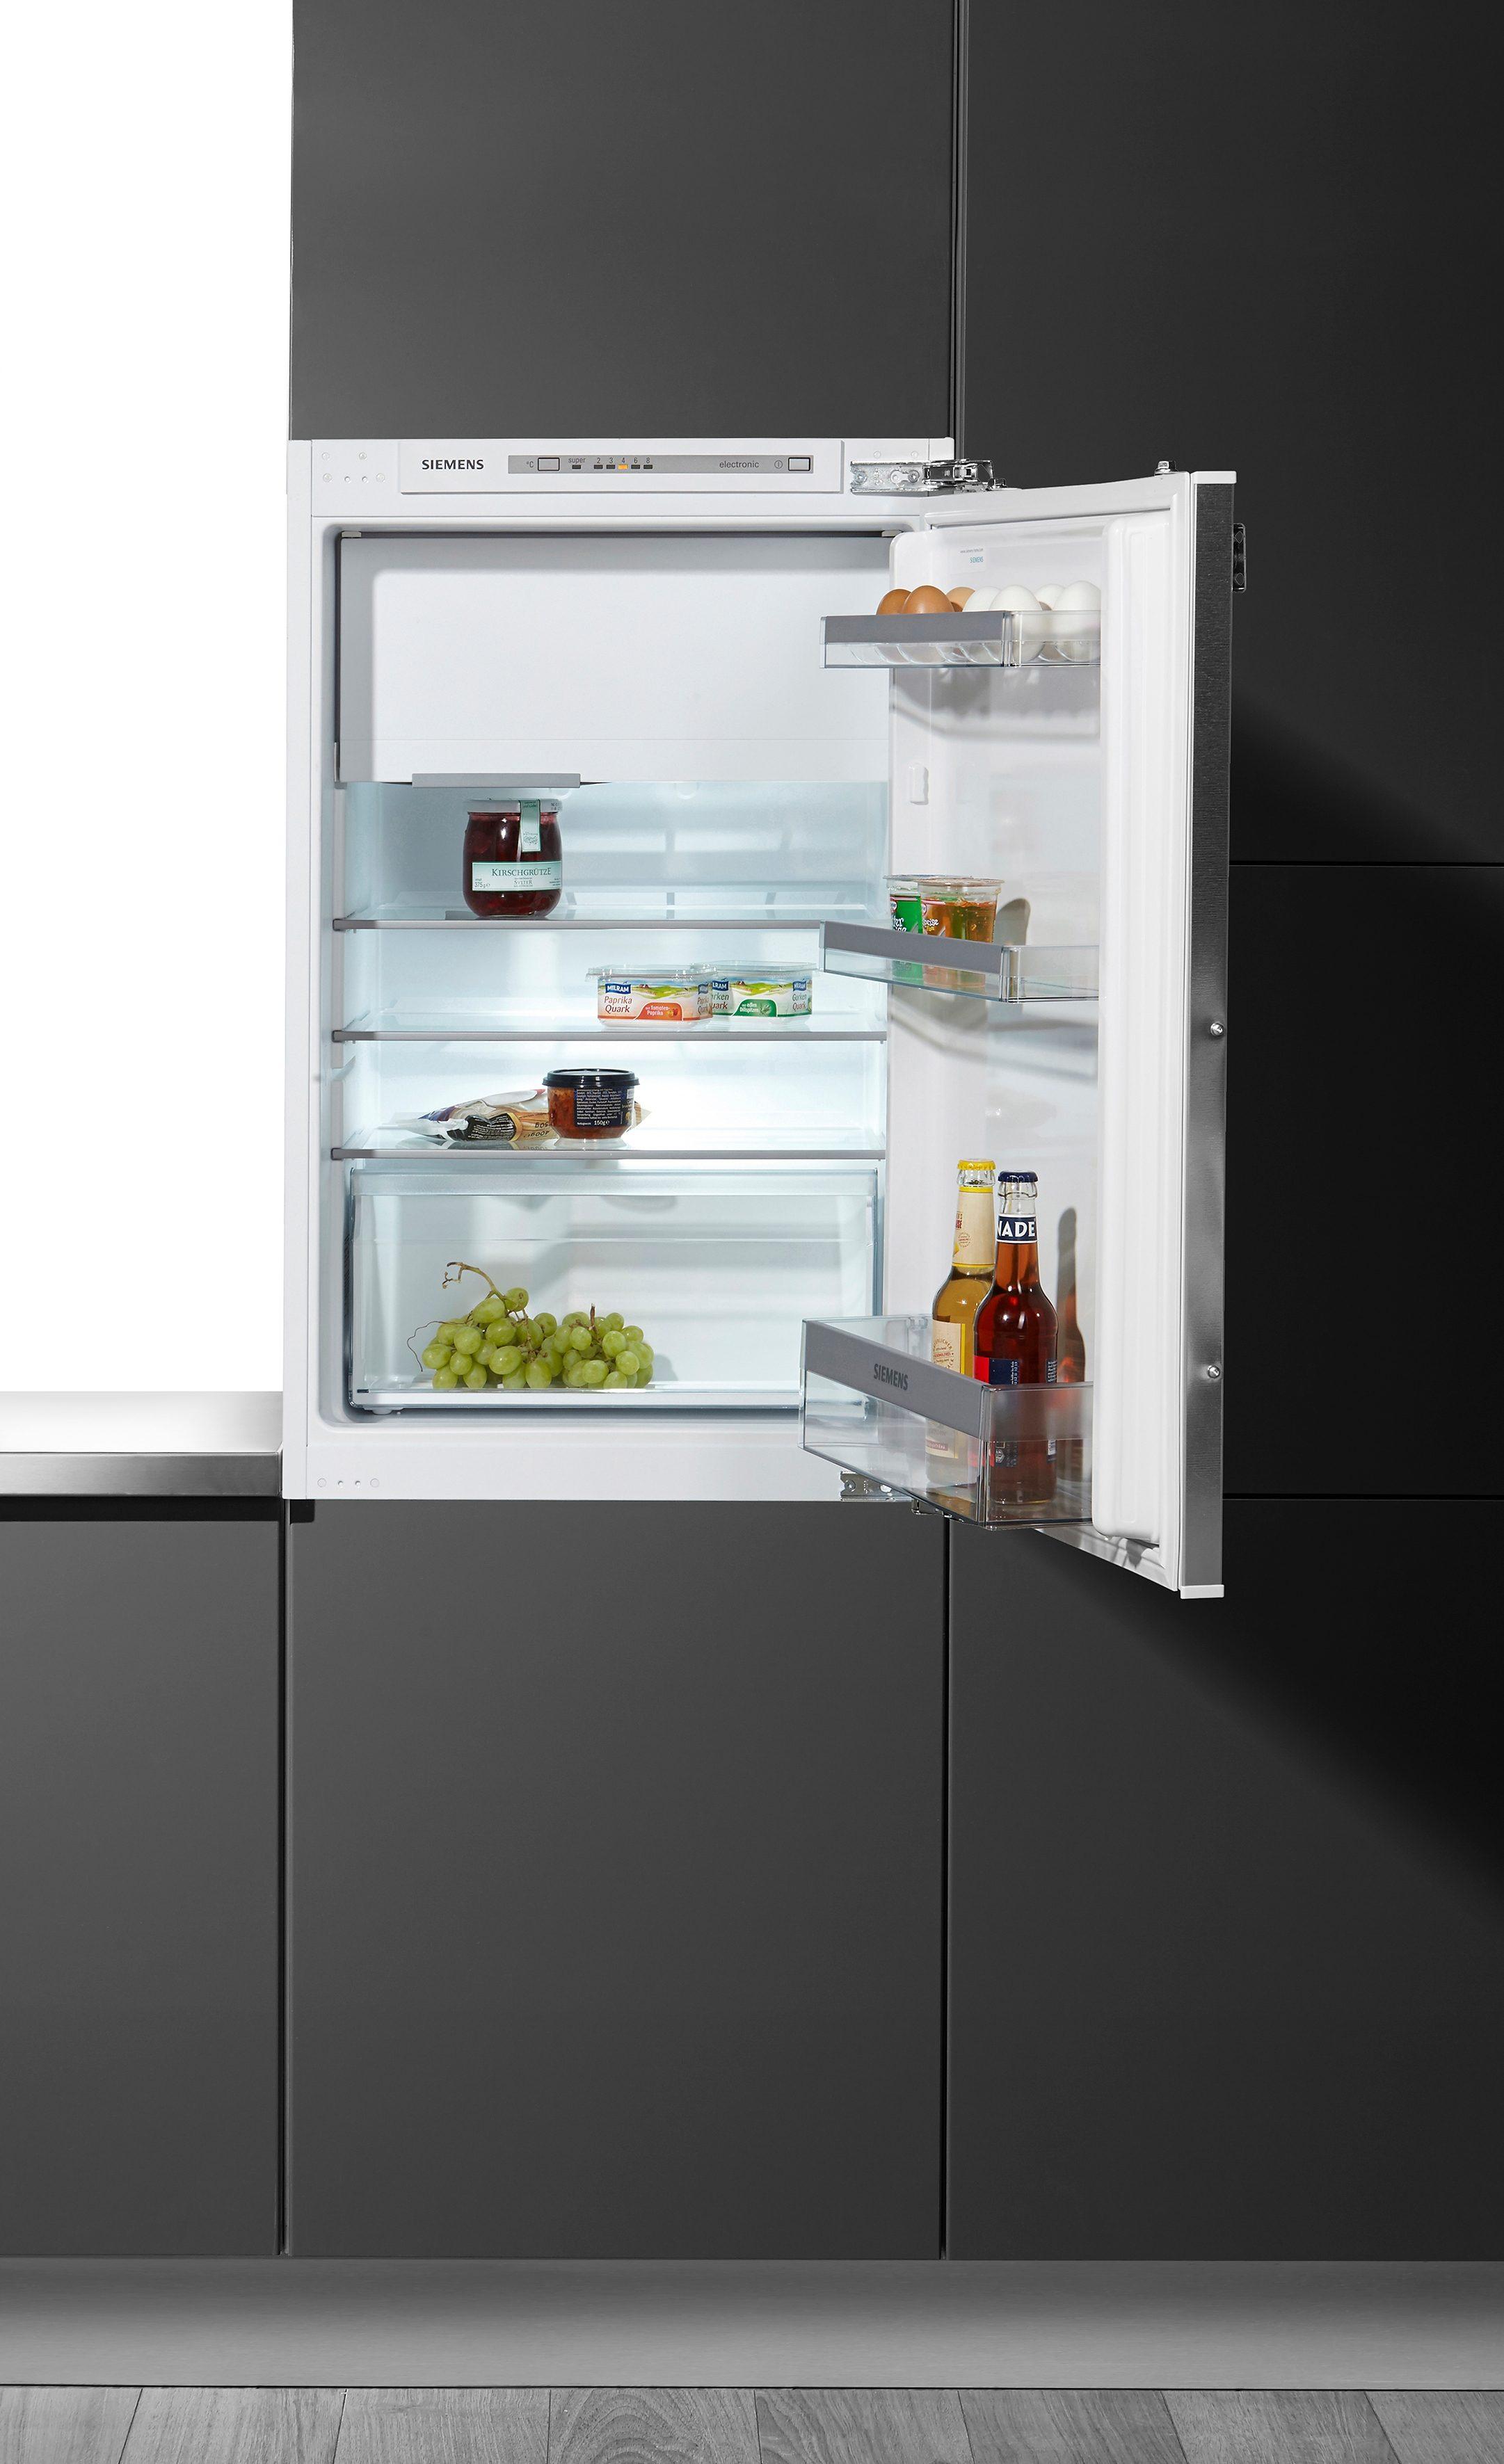 Siemens Einbau-Kühlautomat KI22LVF30, A++, 87,4 cm hoch